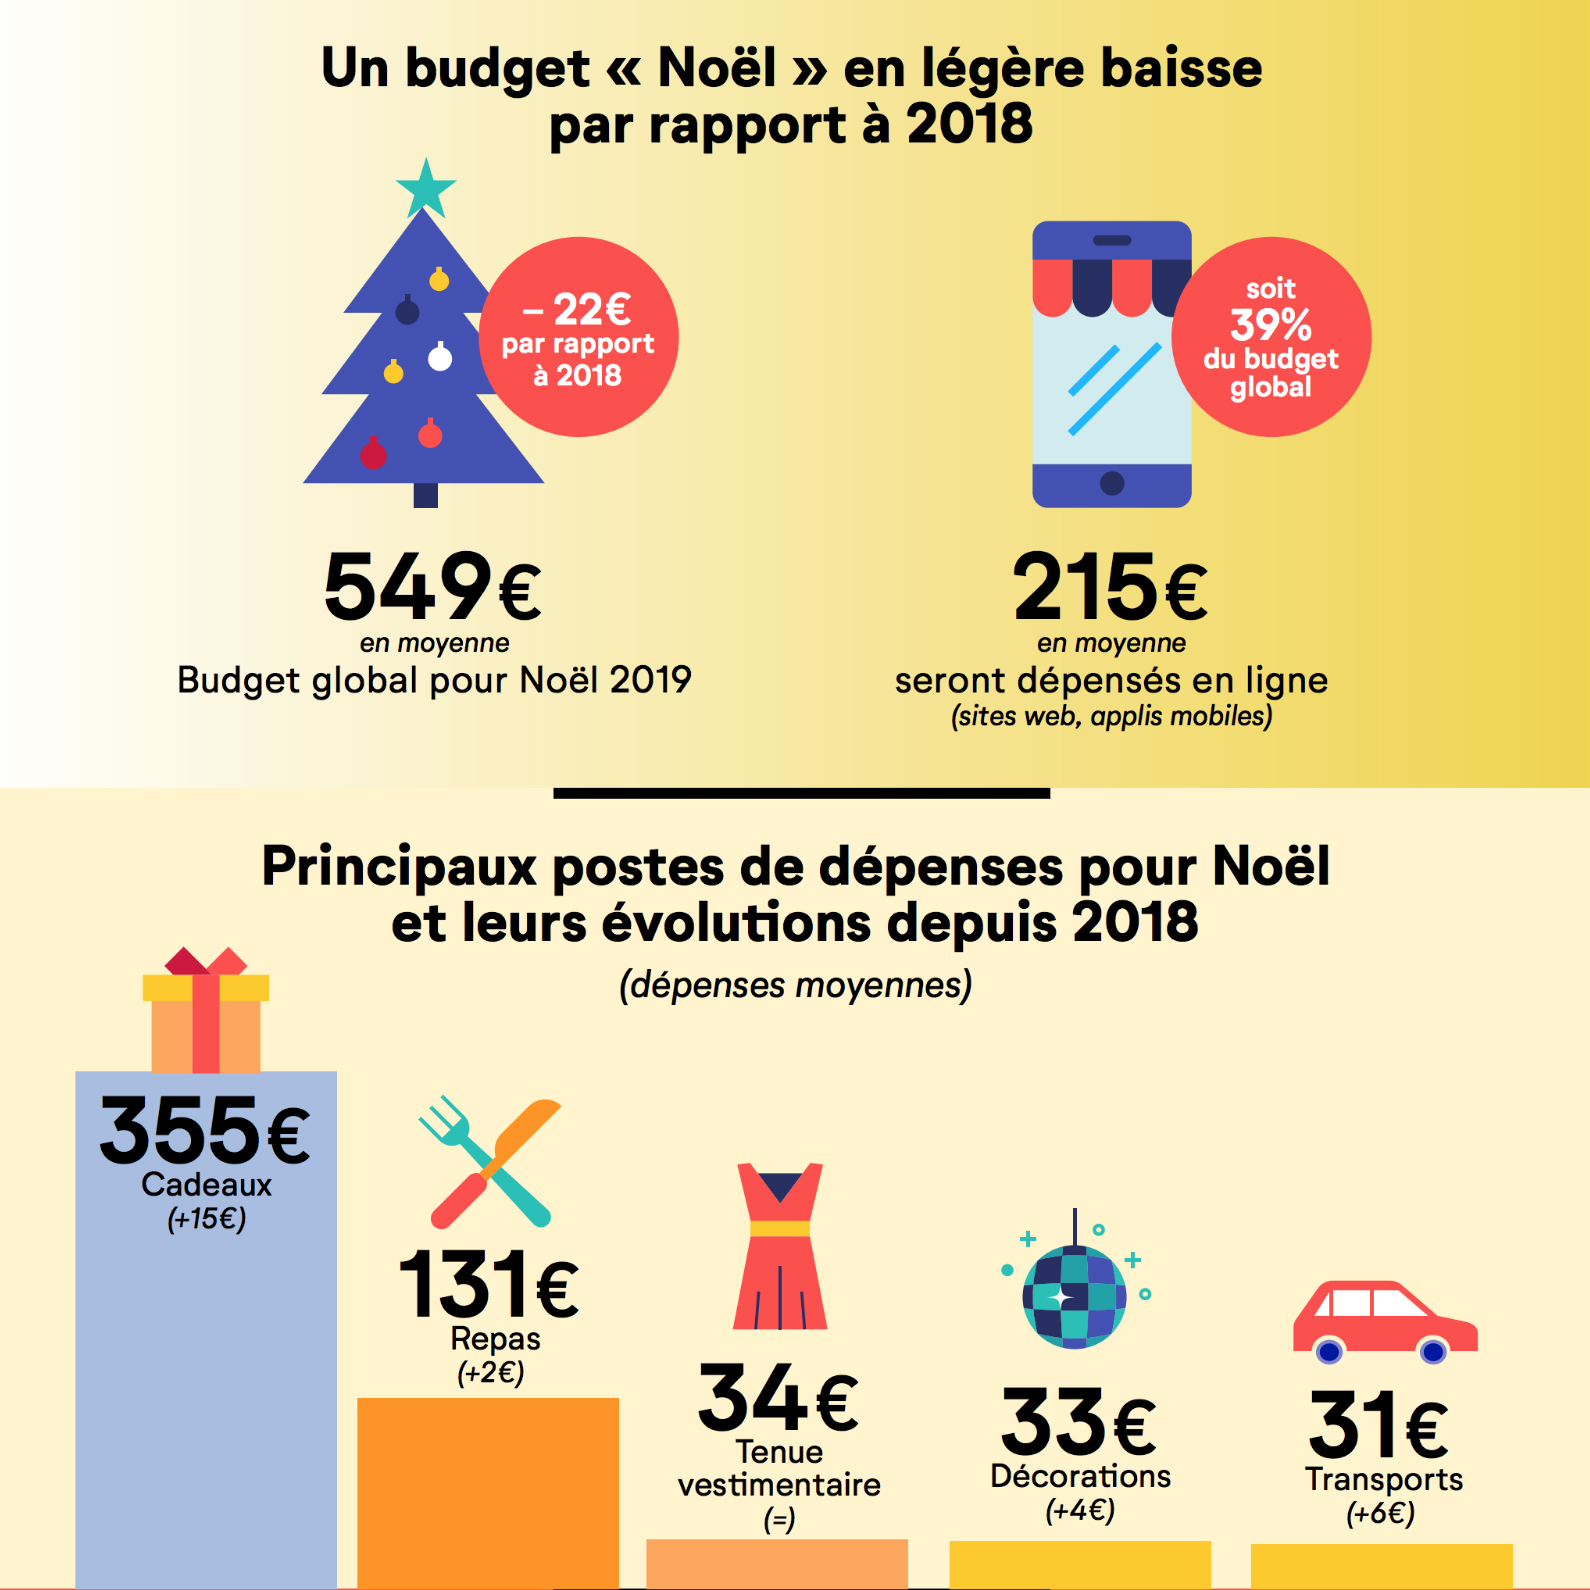 budget_noel_2019_enquete_cofidis__5ddcffbbda6c8.jpg